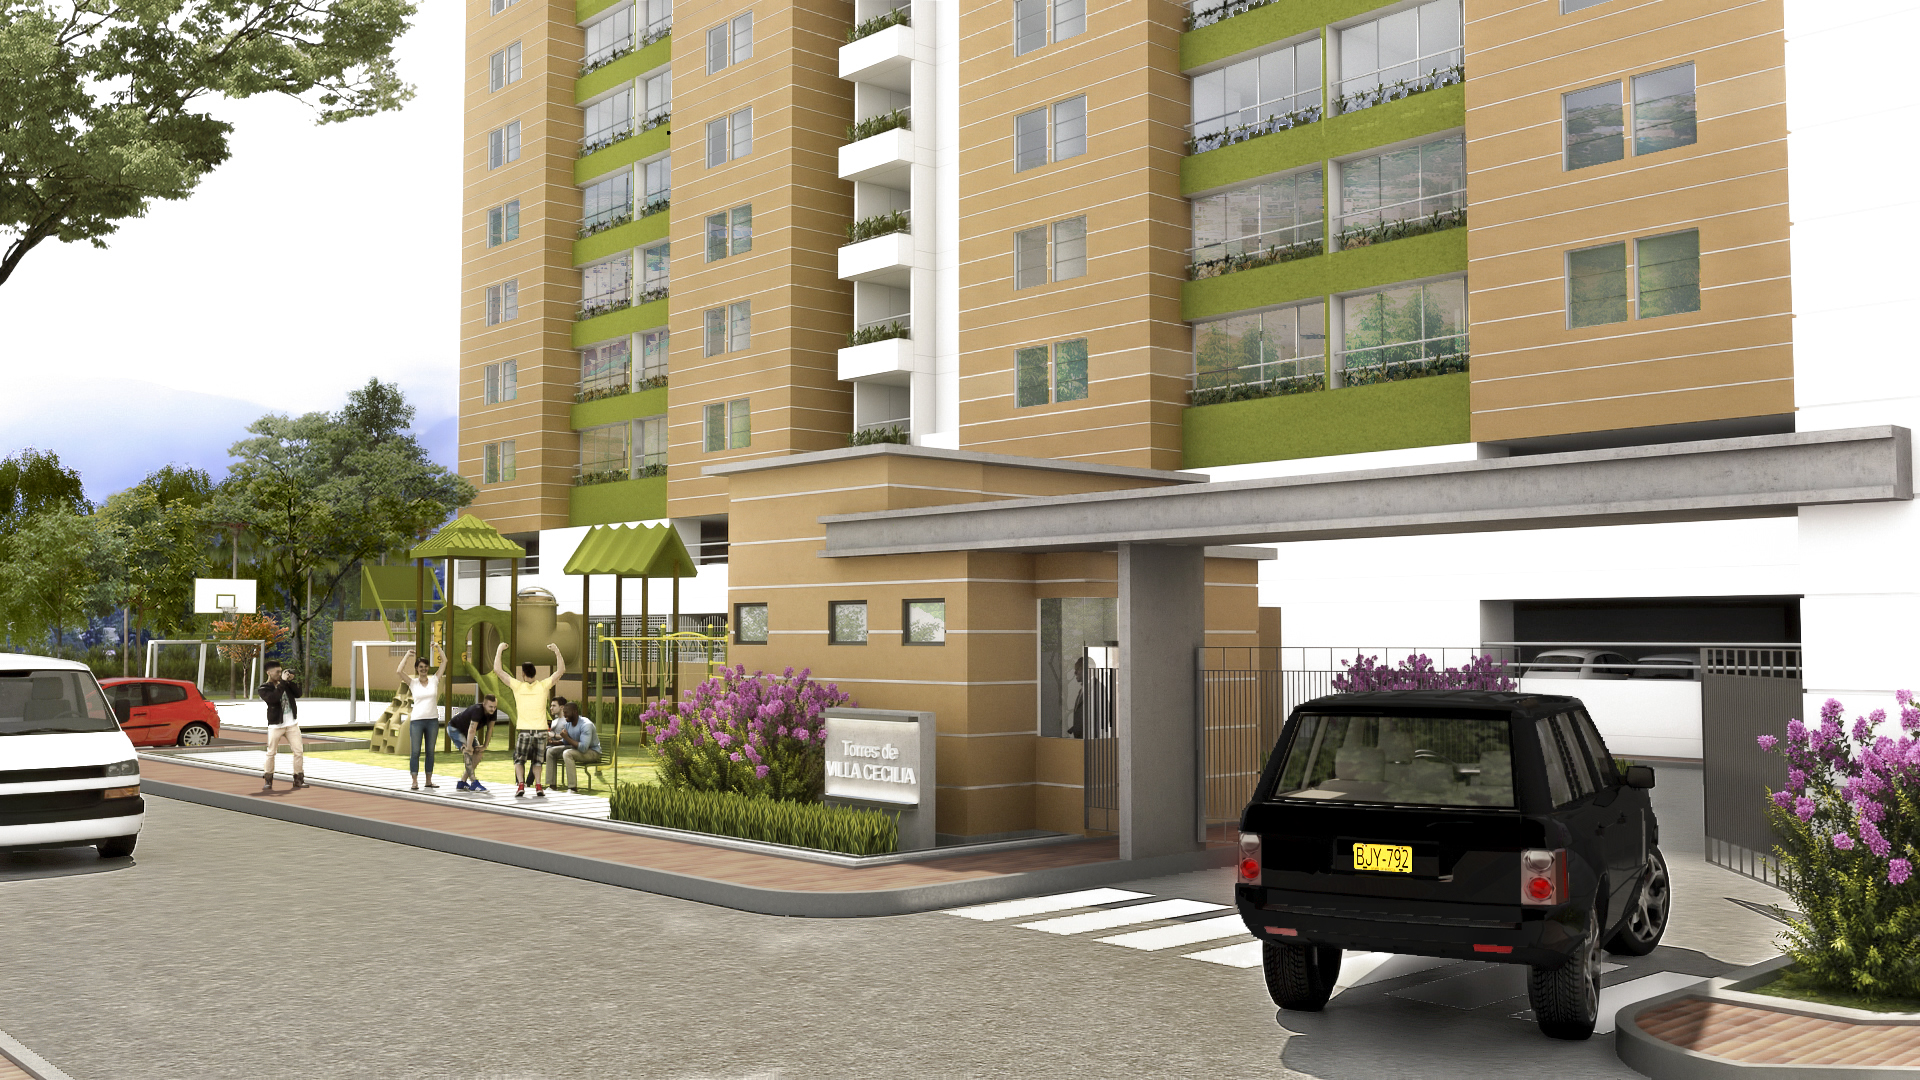 Conjunto residencial en Cúcuta